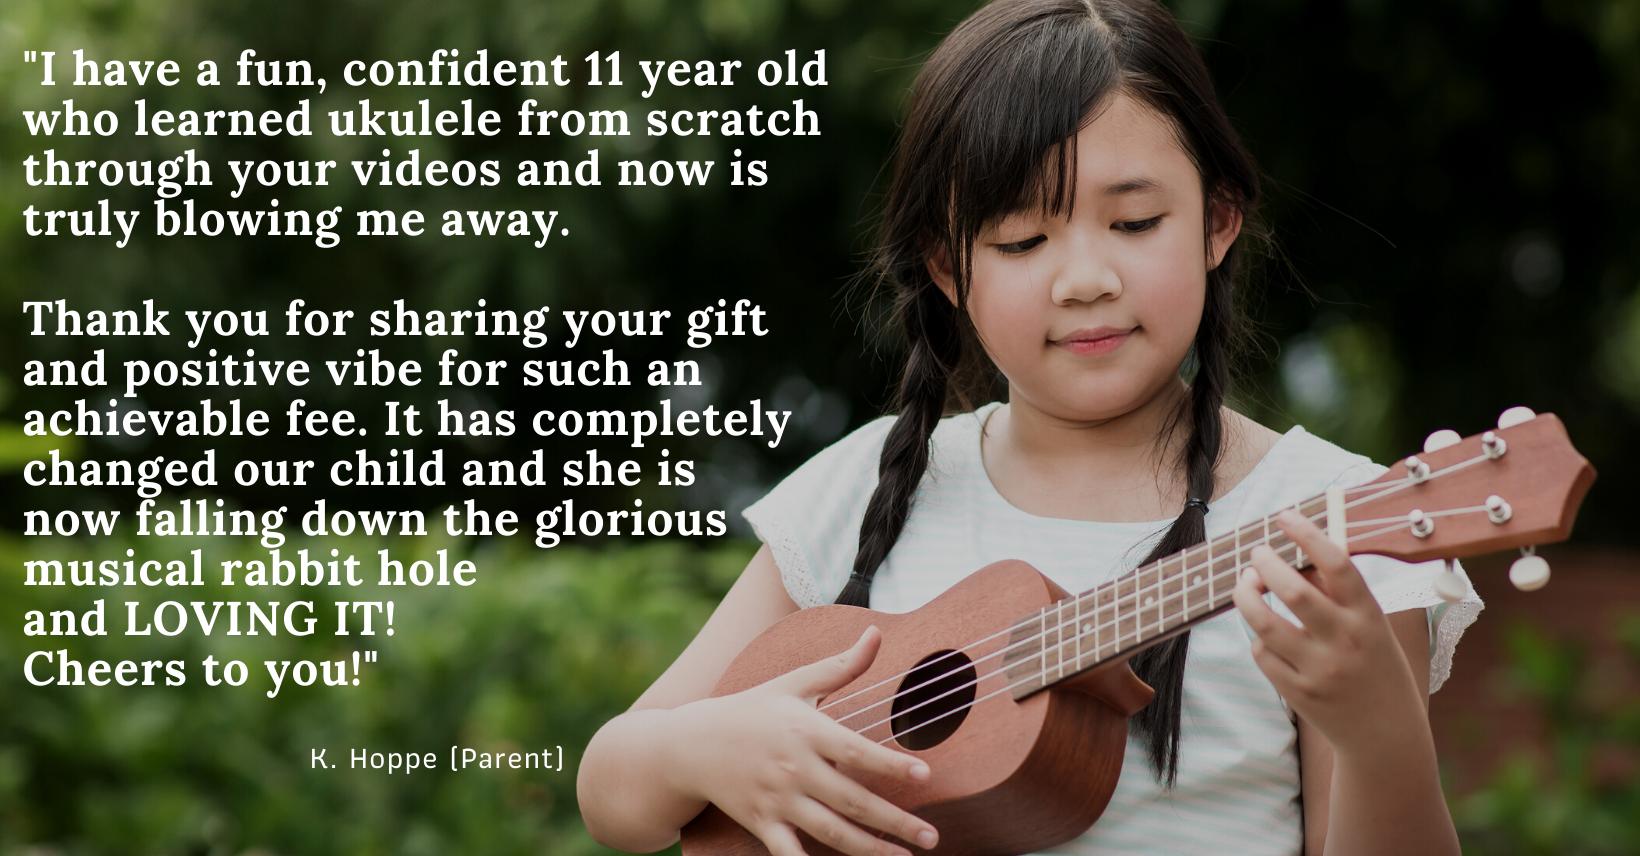 testimonial from parent of 11 year old ukulele student